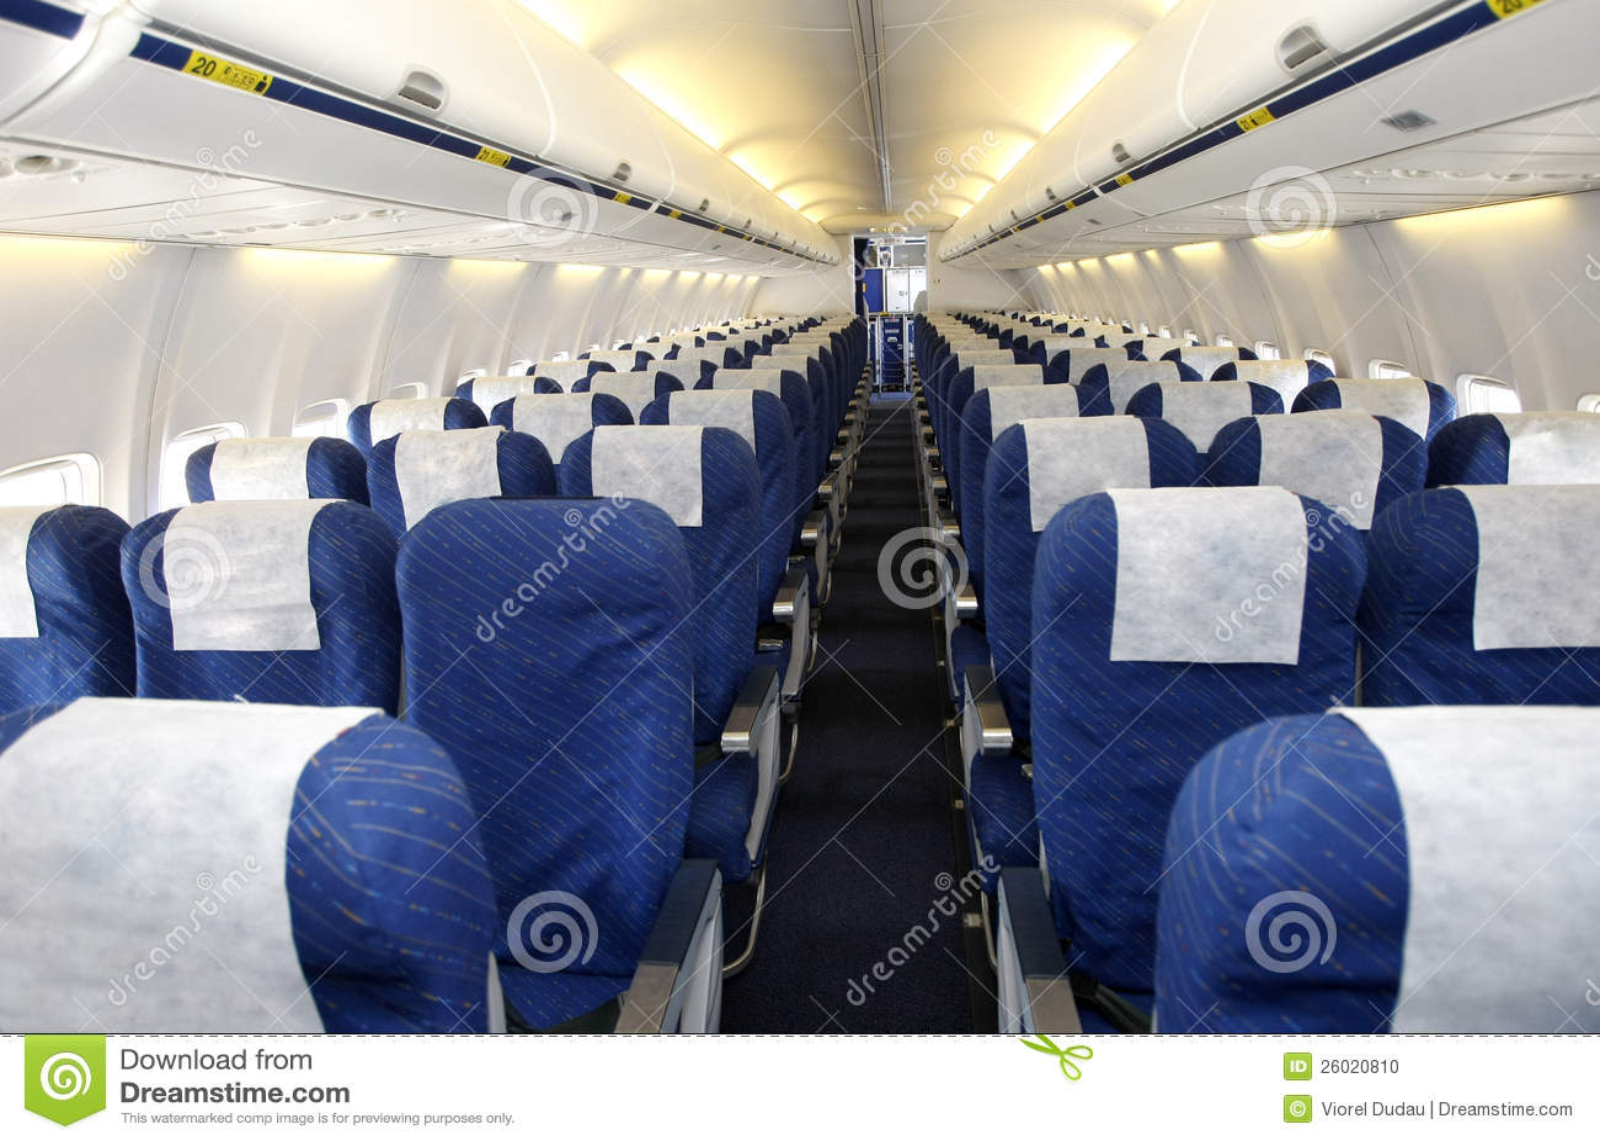 empty plane interior stock photo image of indoor corridor 26020810